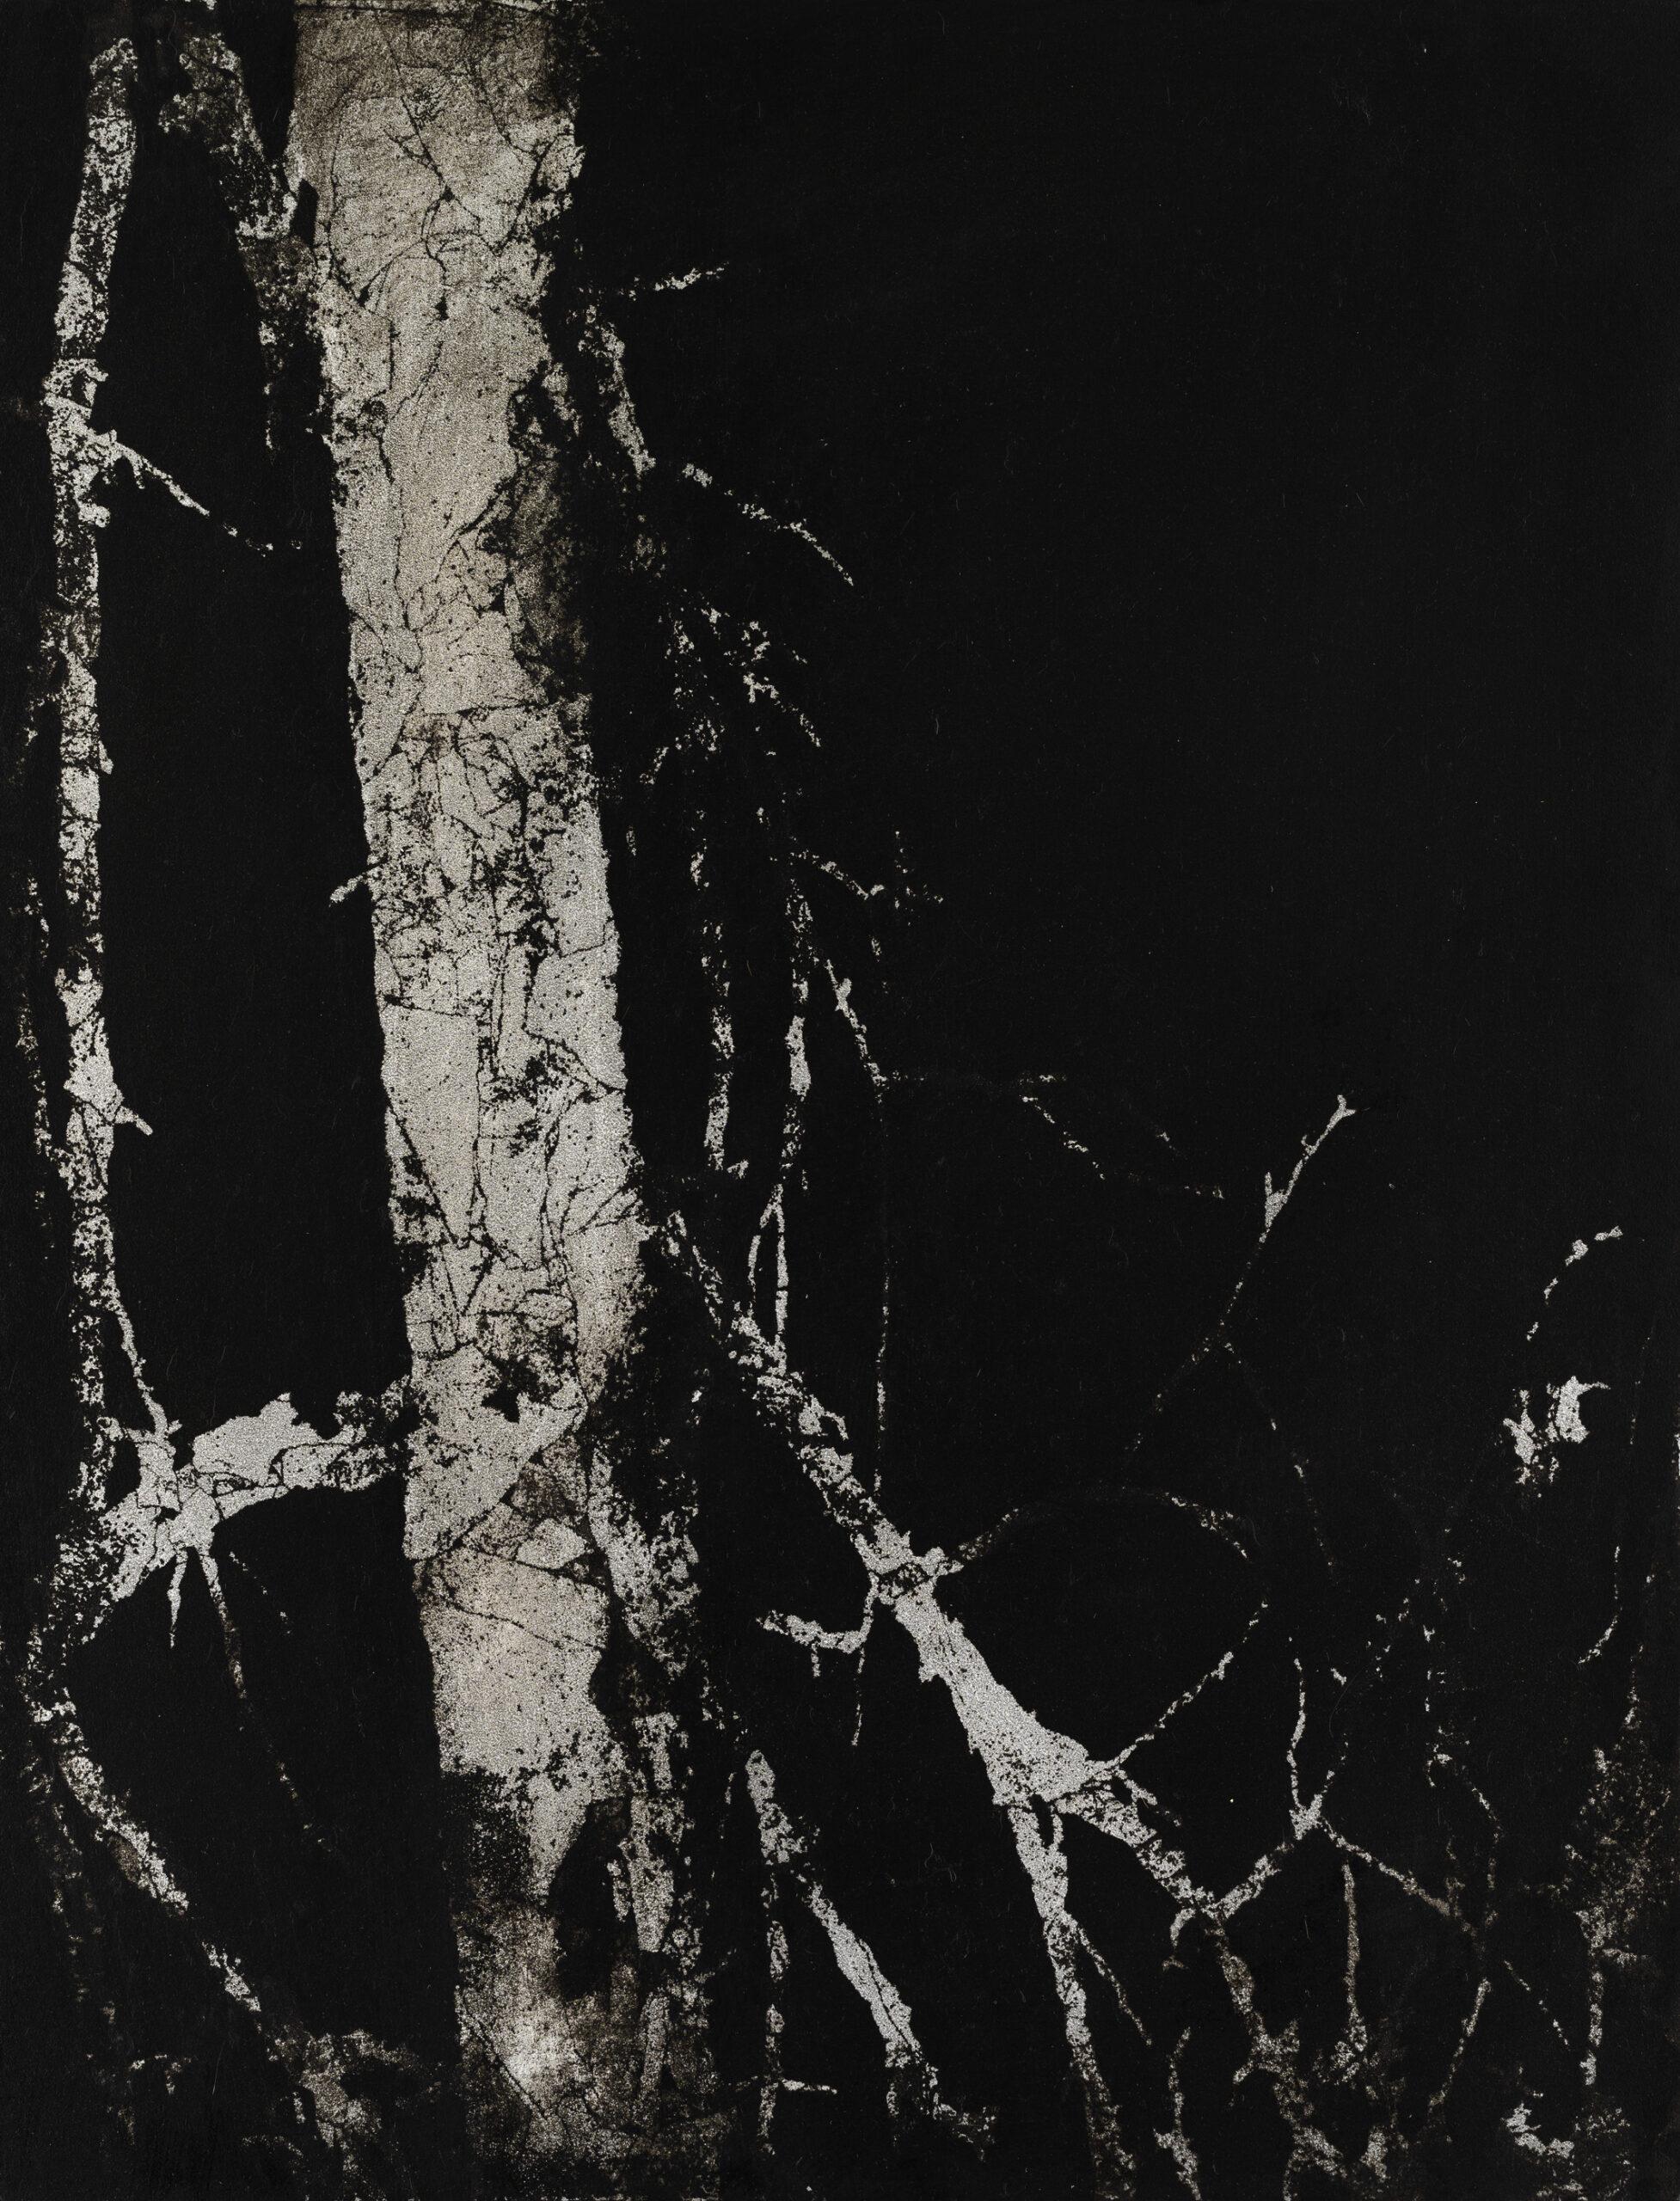 Untitled 2015, Acryl und Blattaluminium auf Holz 60 x 46 cm